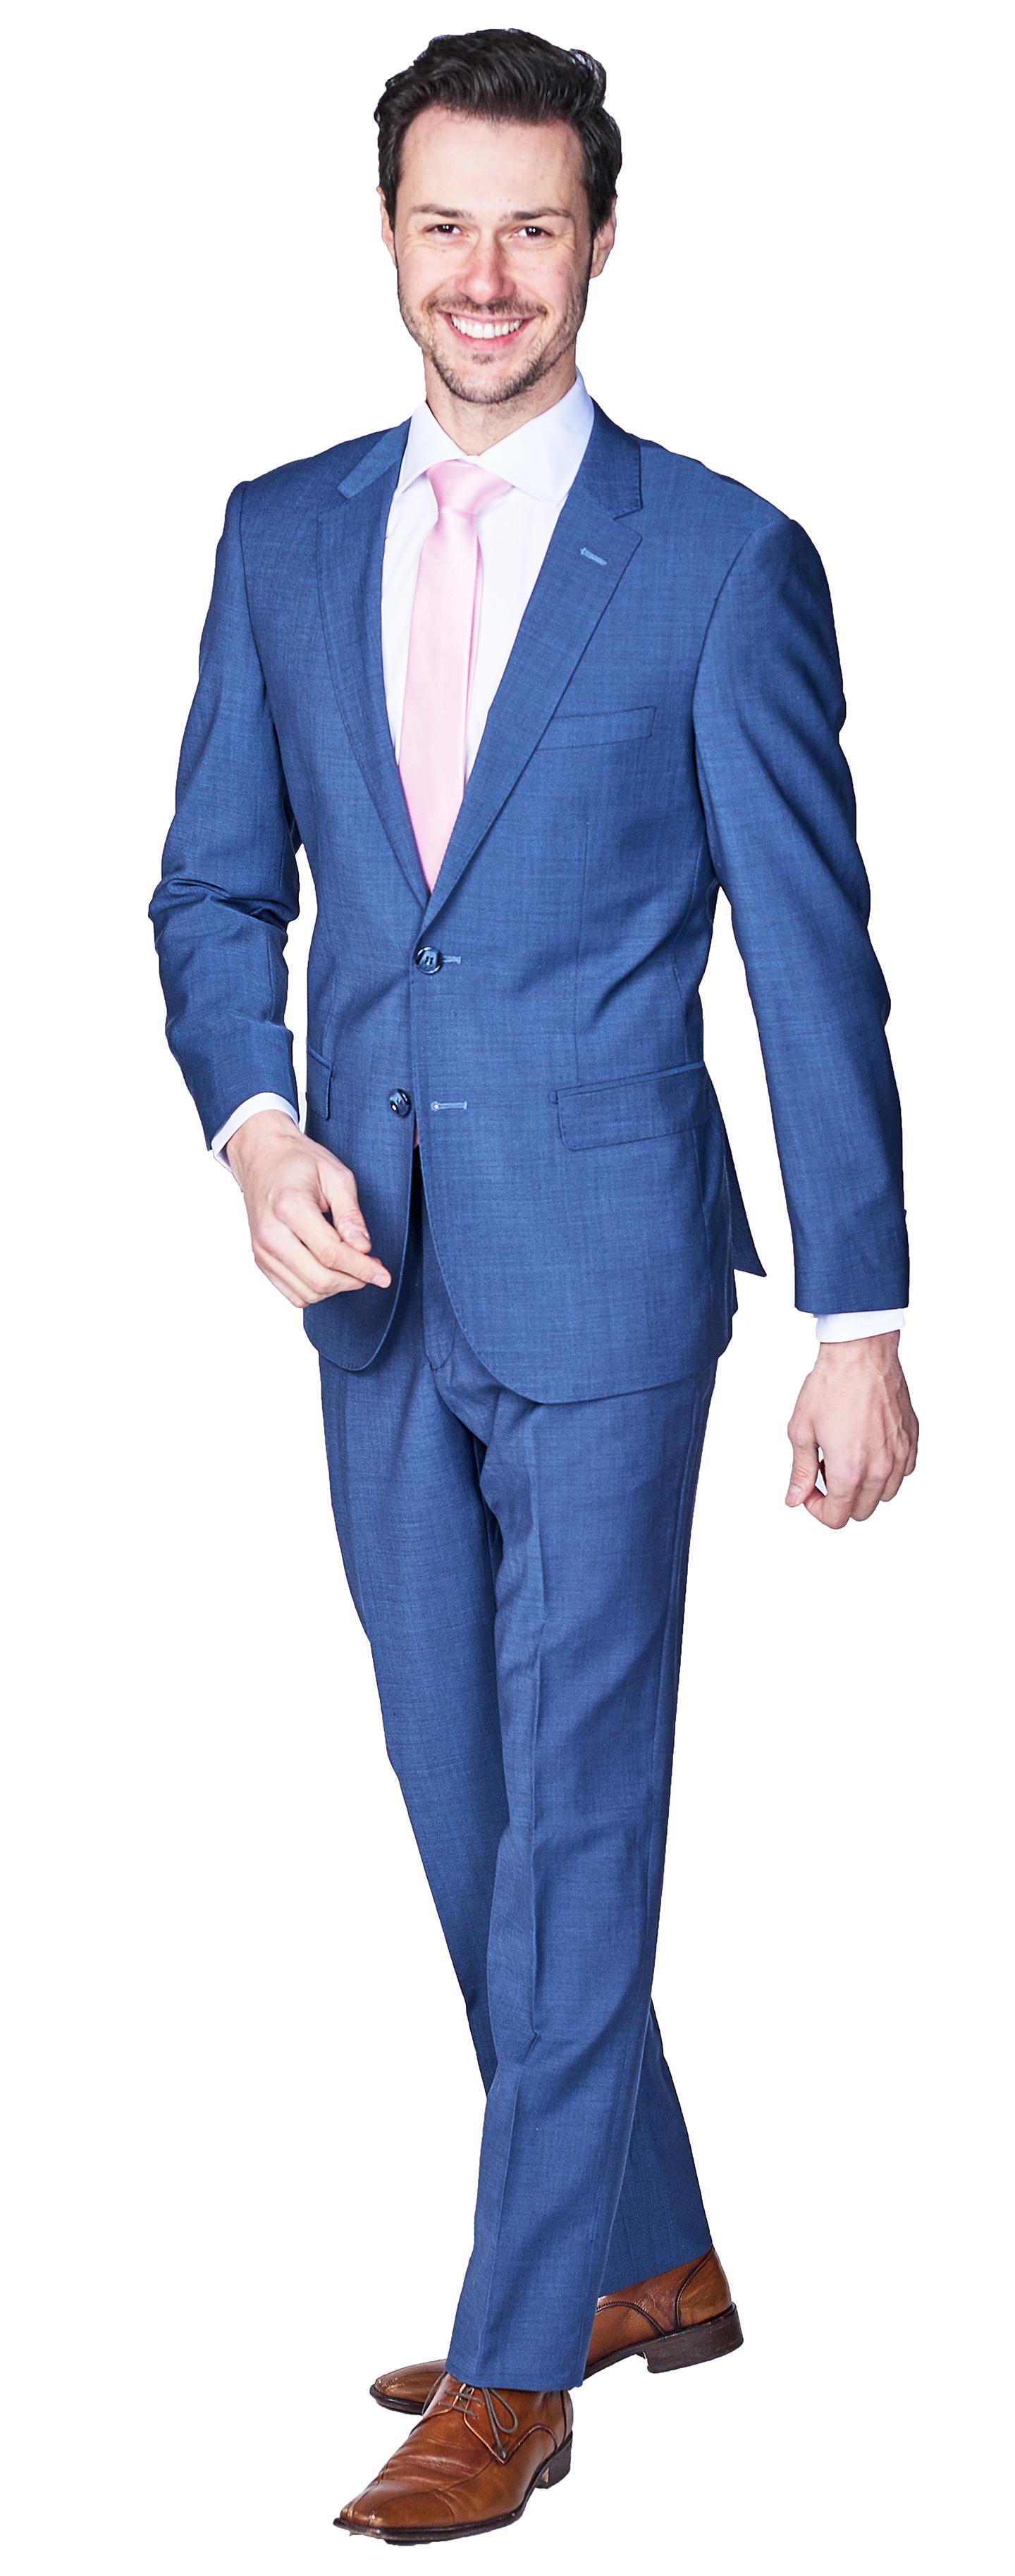 Giovanni Bresciani Slate Blue SuitGB-262$850.00 USD.png